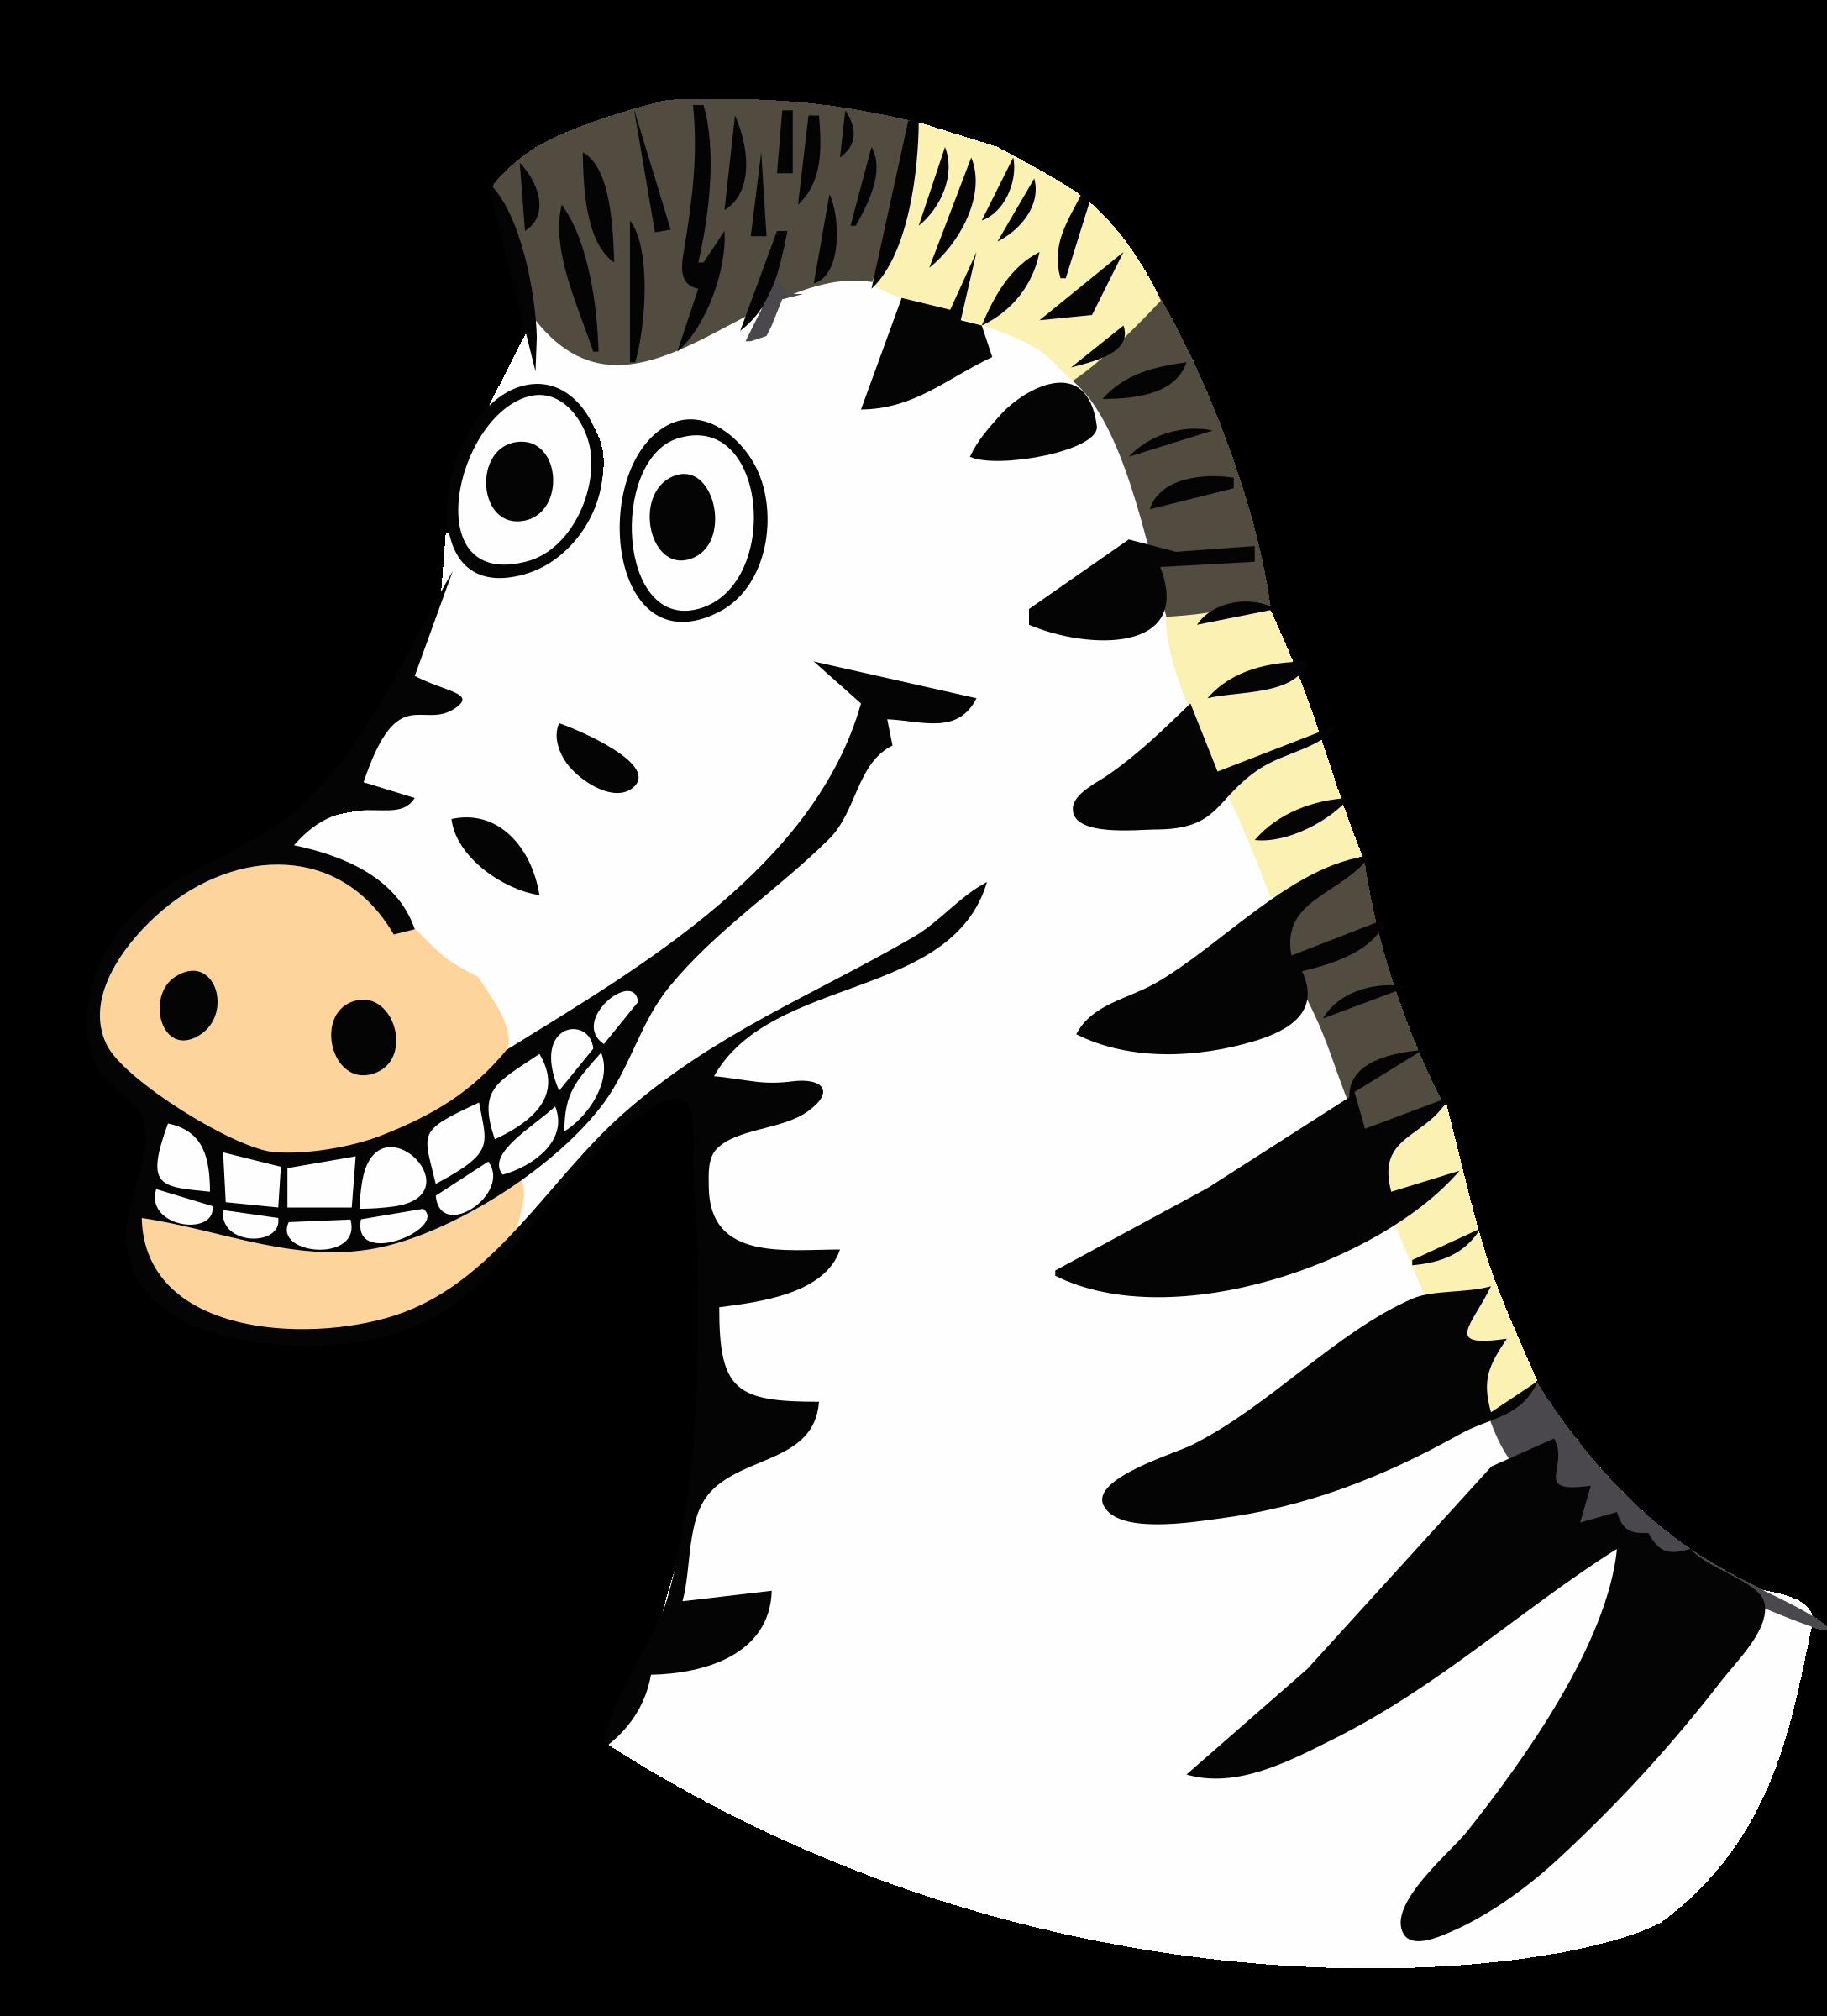 Drawn big image png. Cute clipart zebra